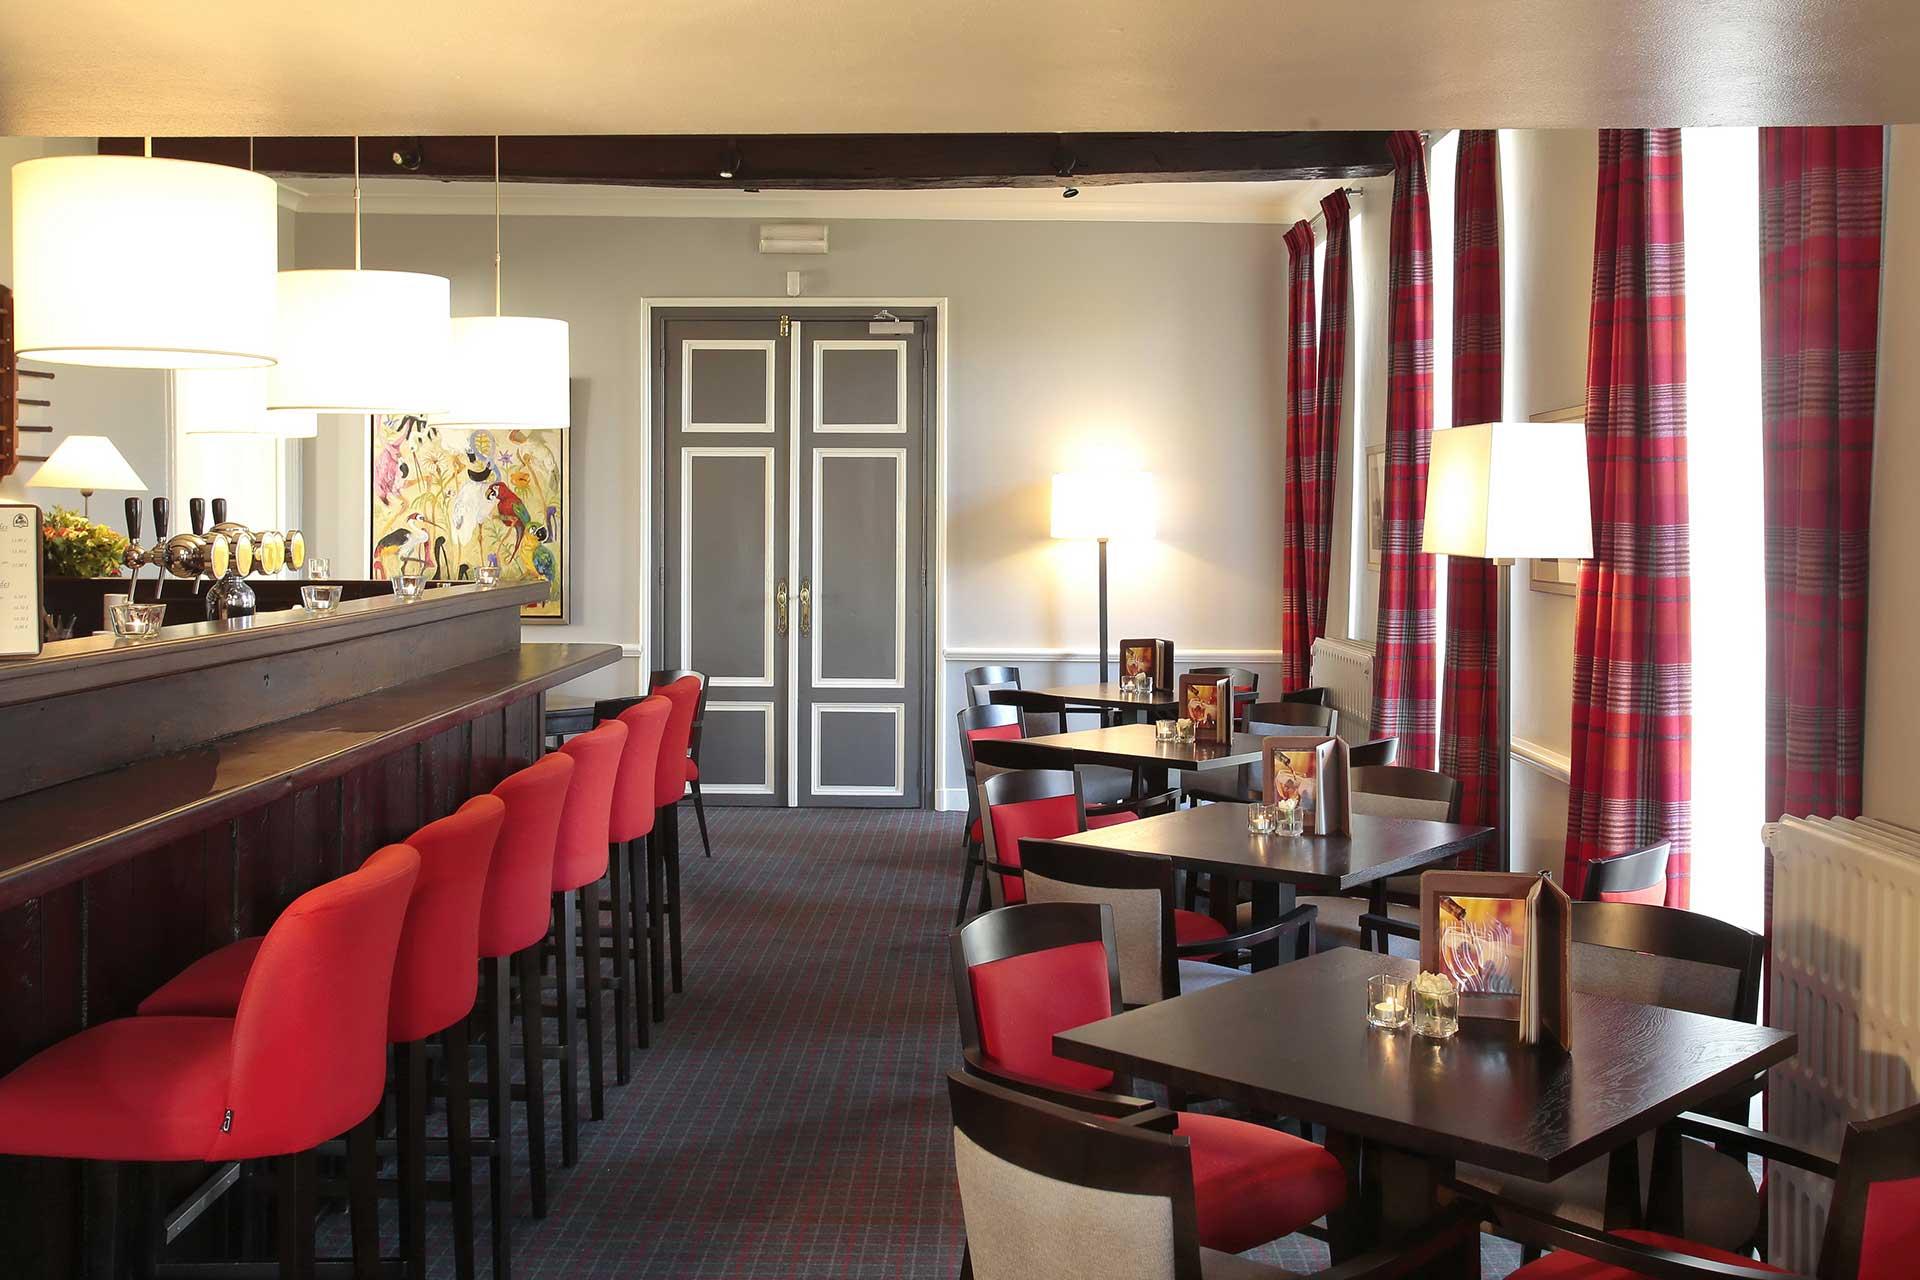 Golfexpedition-golfreizen-België-Brussel-Pierpont-clubhouse-bar